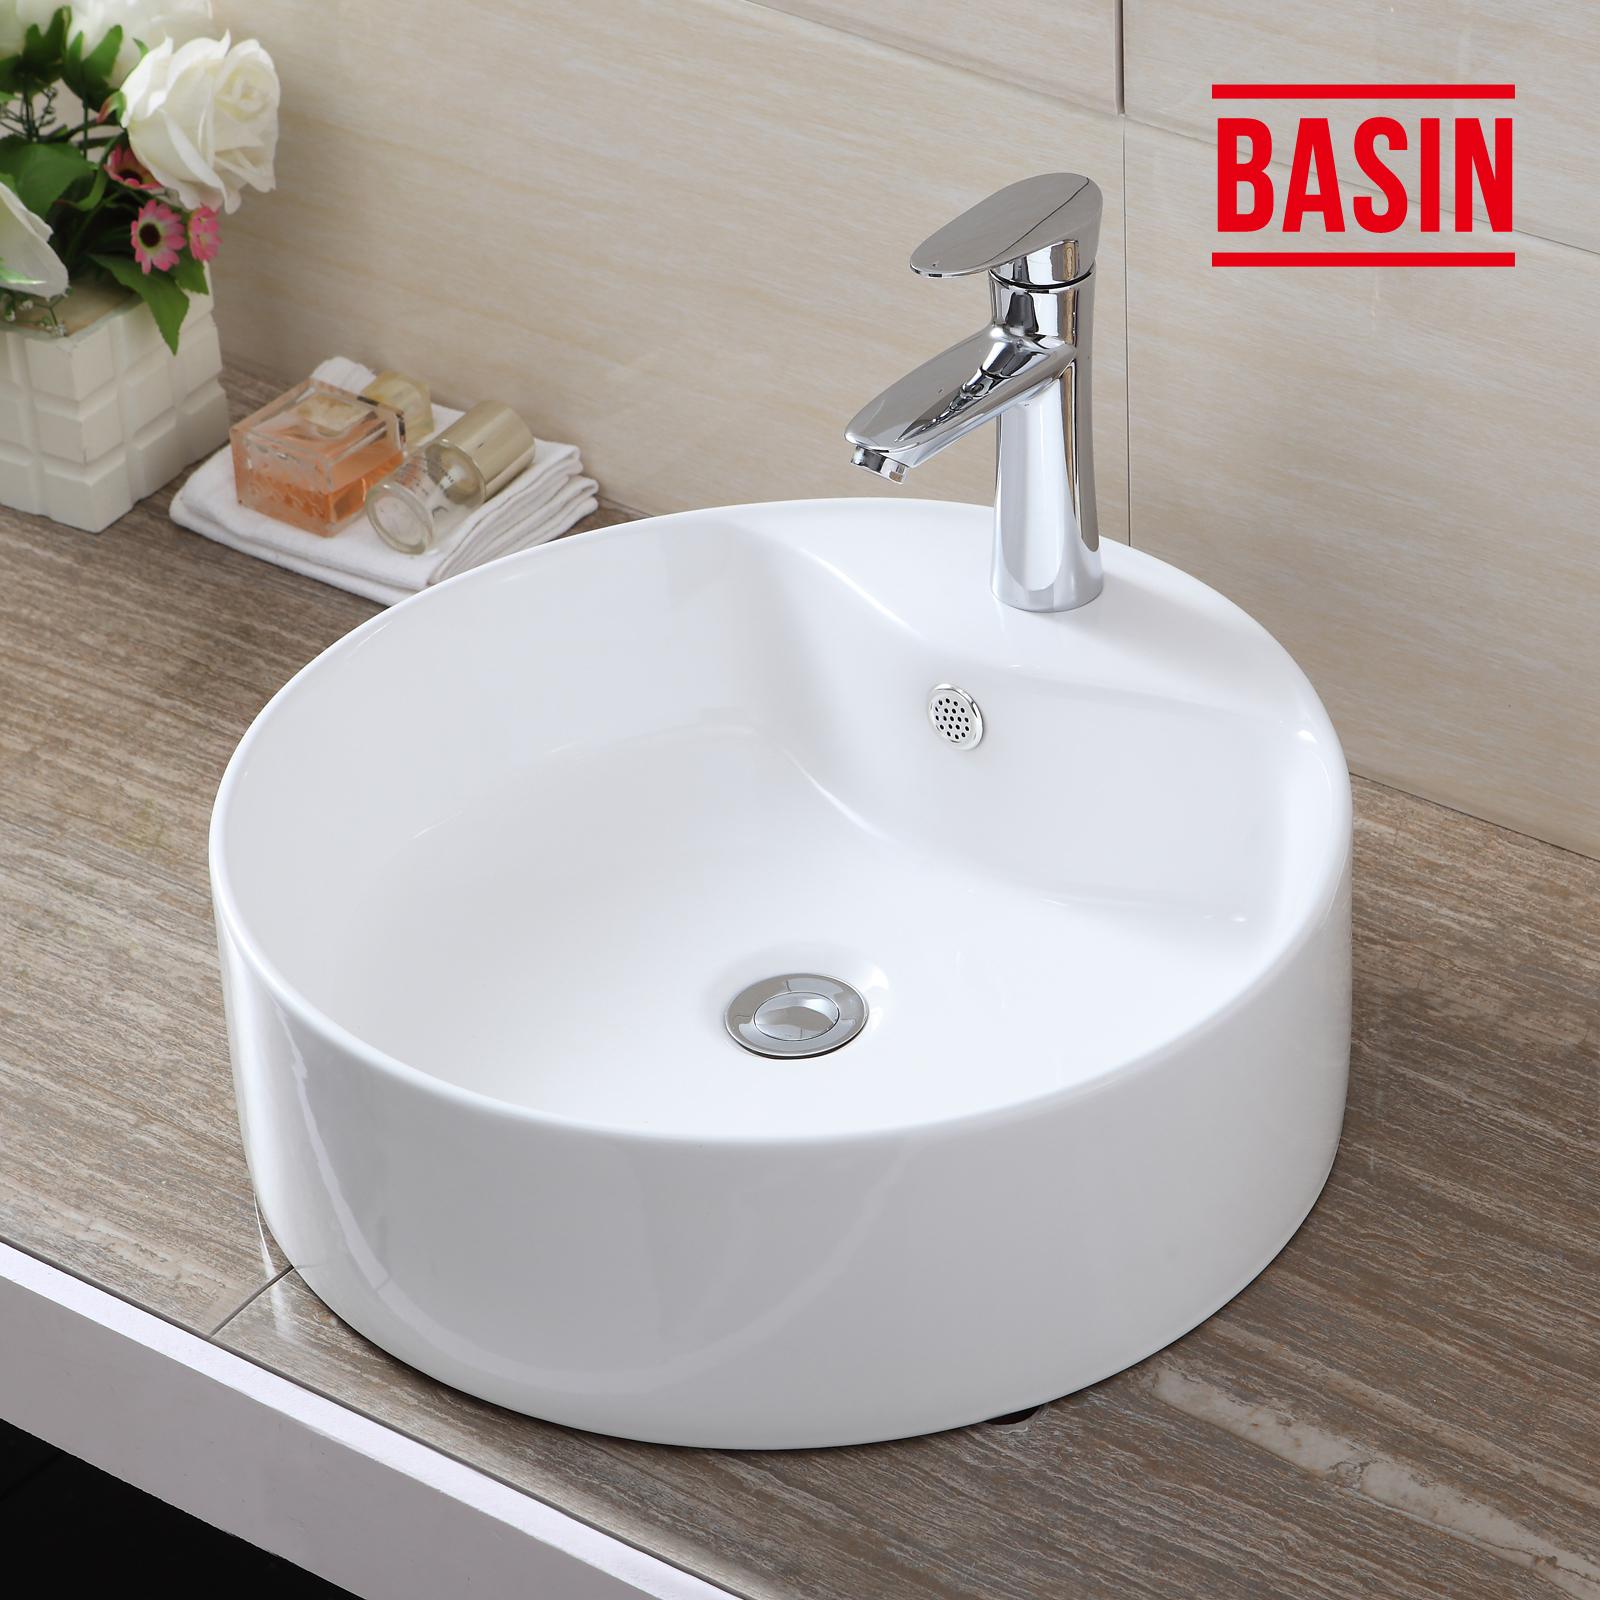 Bathroom cloakroom white round ceramic countertop washing for Wash basin bathroom sink